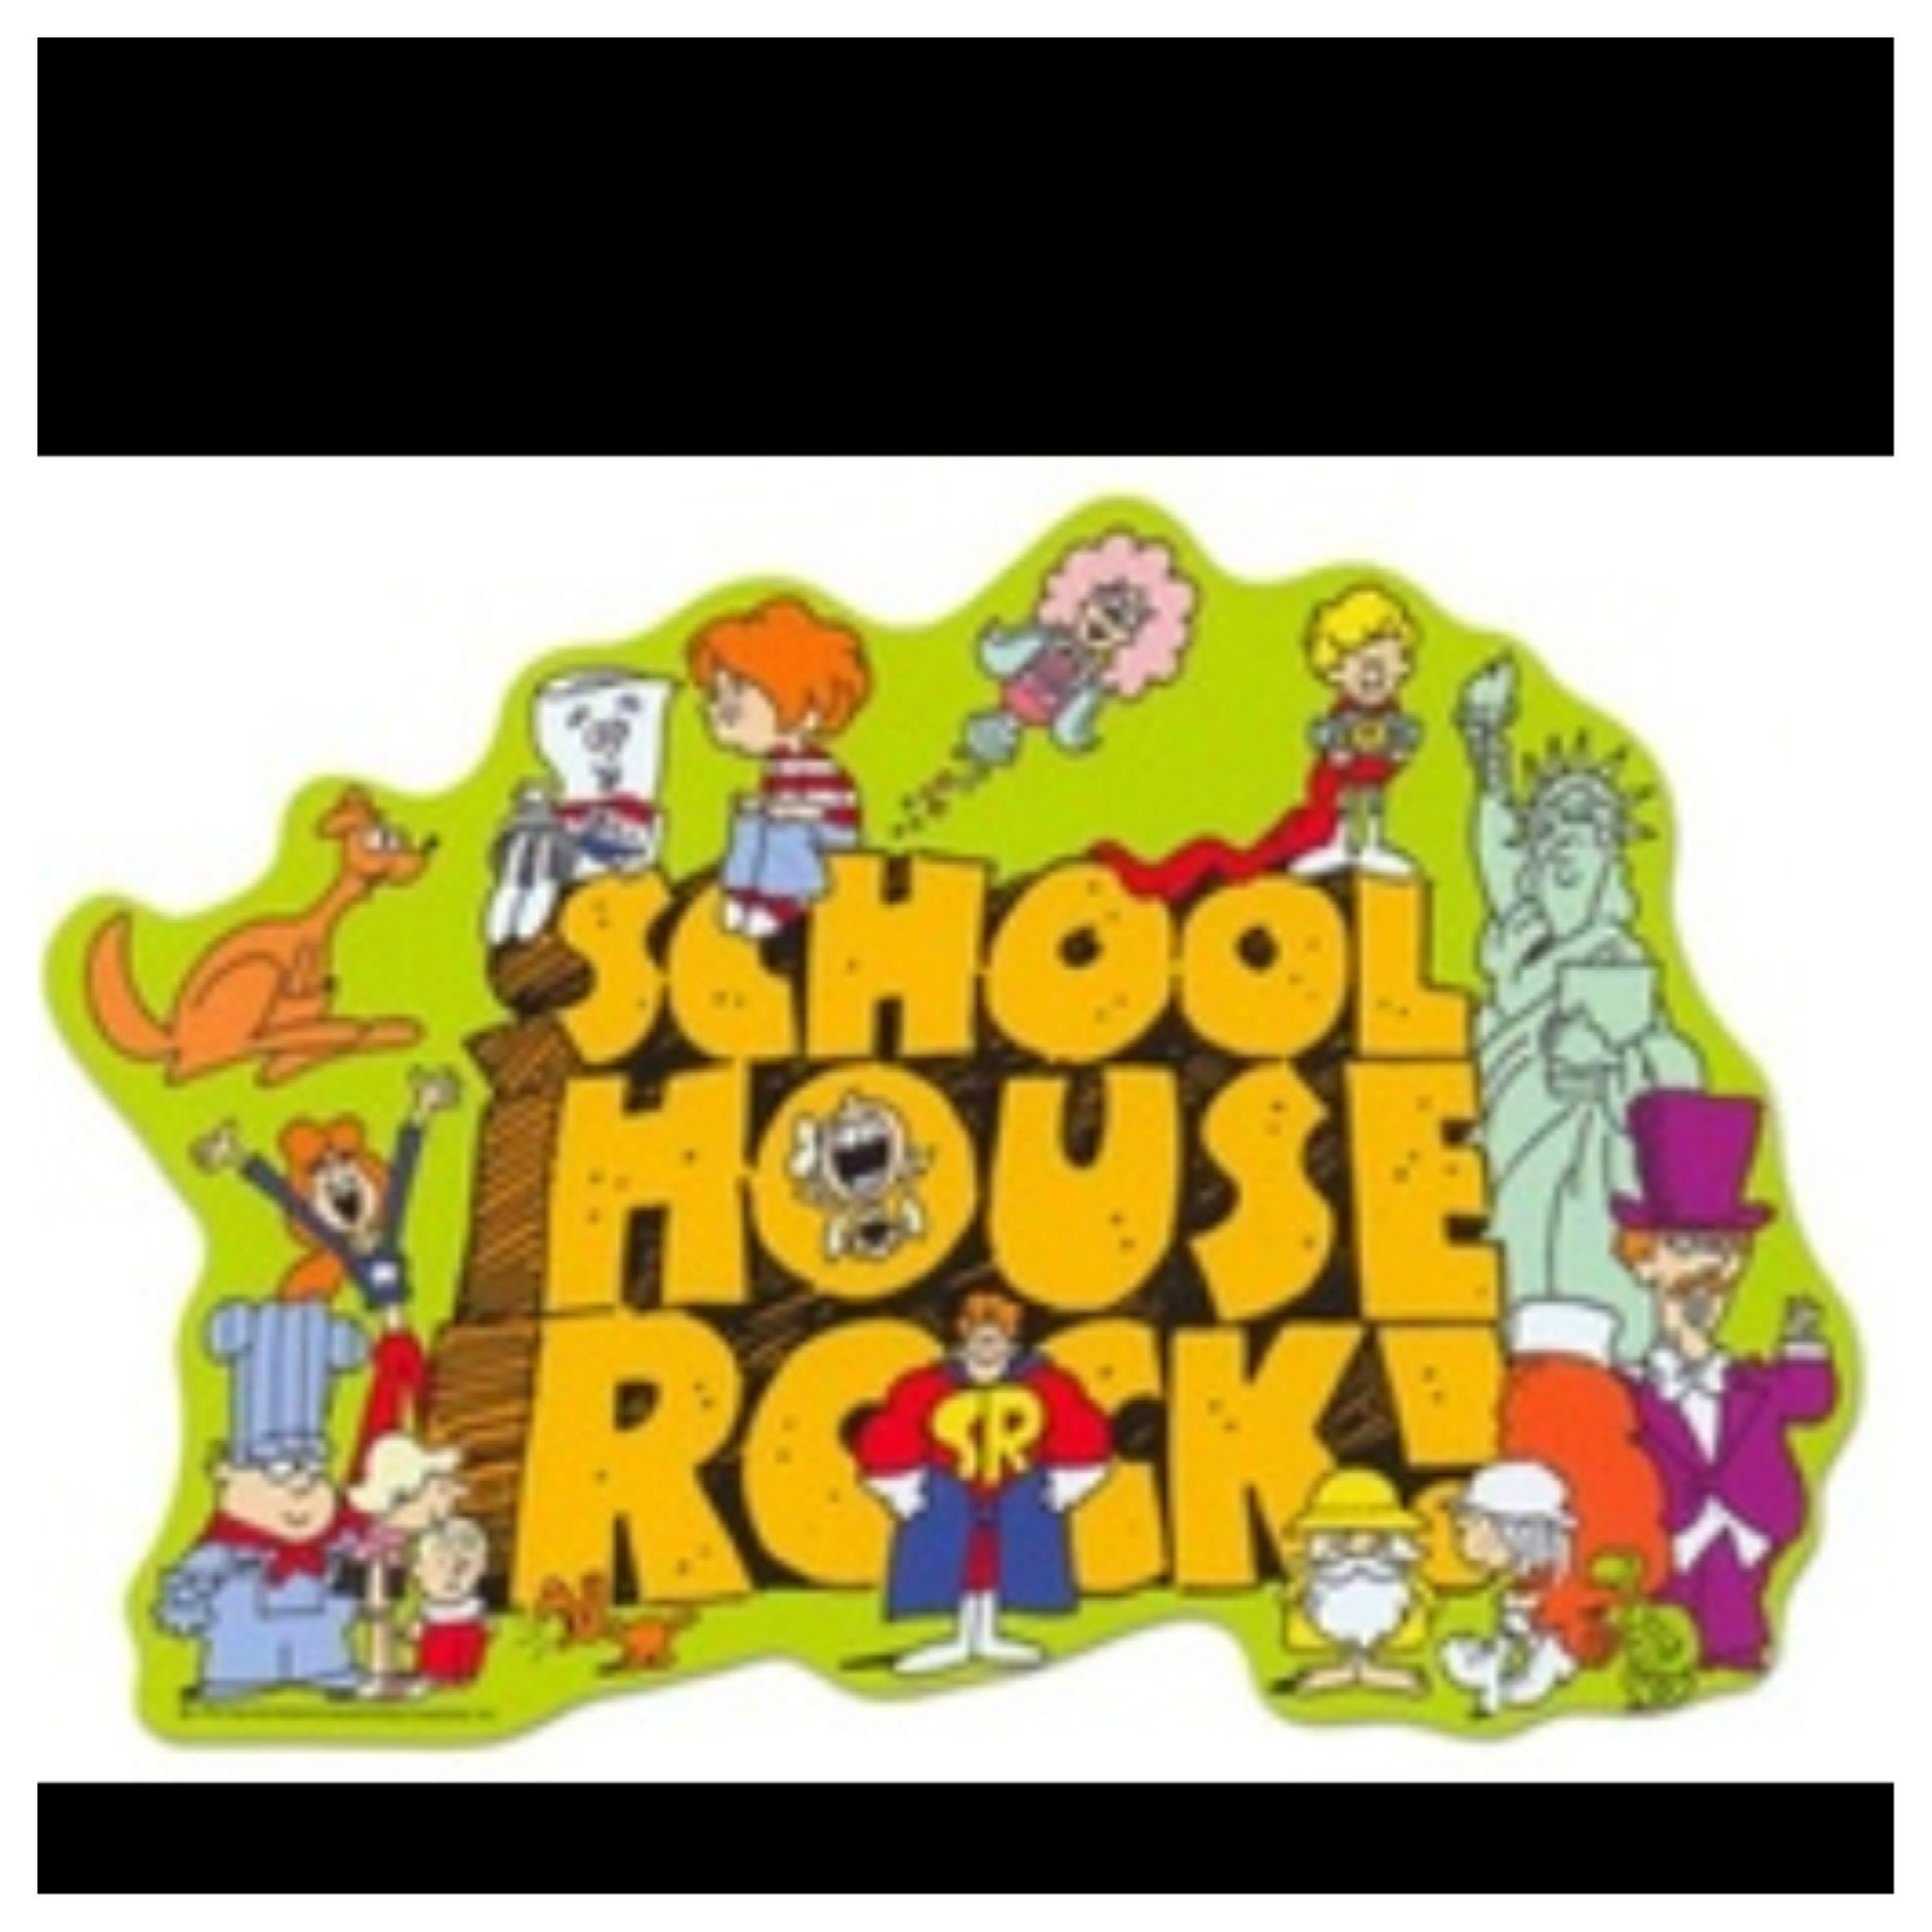 Uncategorized Schoolhouse Rock Adverb schoolhouse rock conjunction junction whats your function blast function